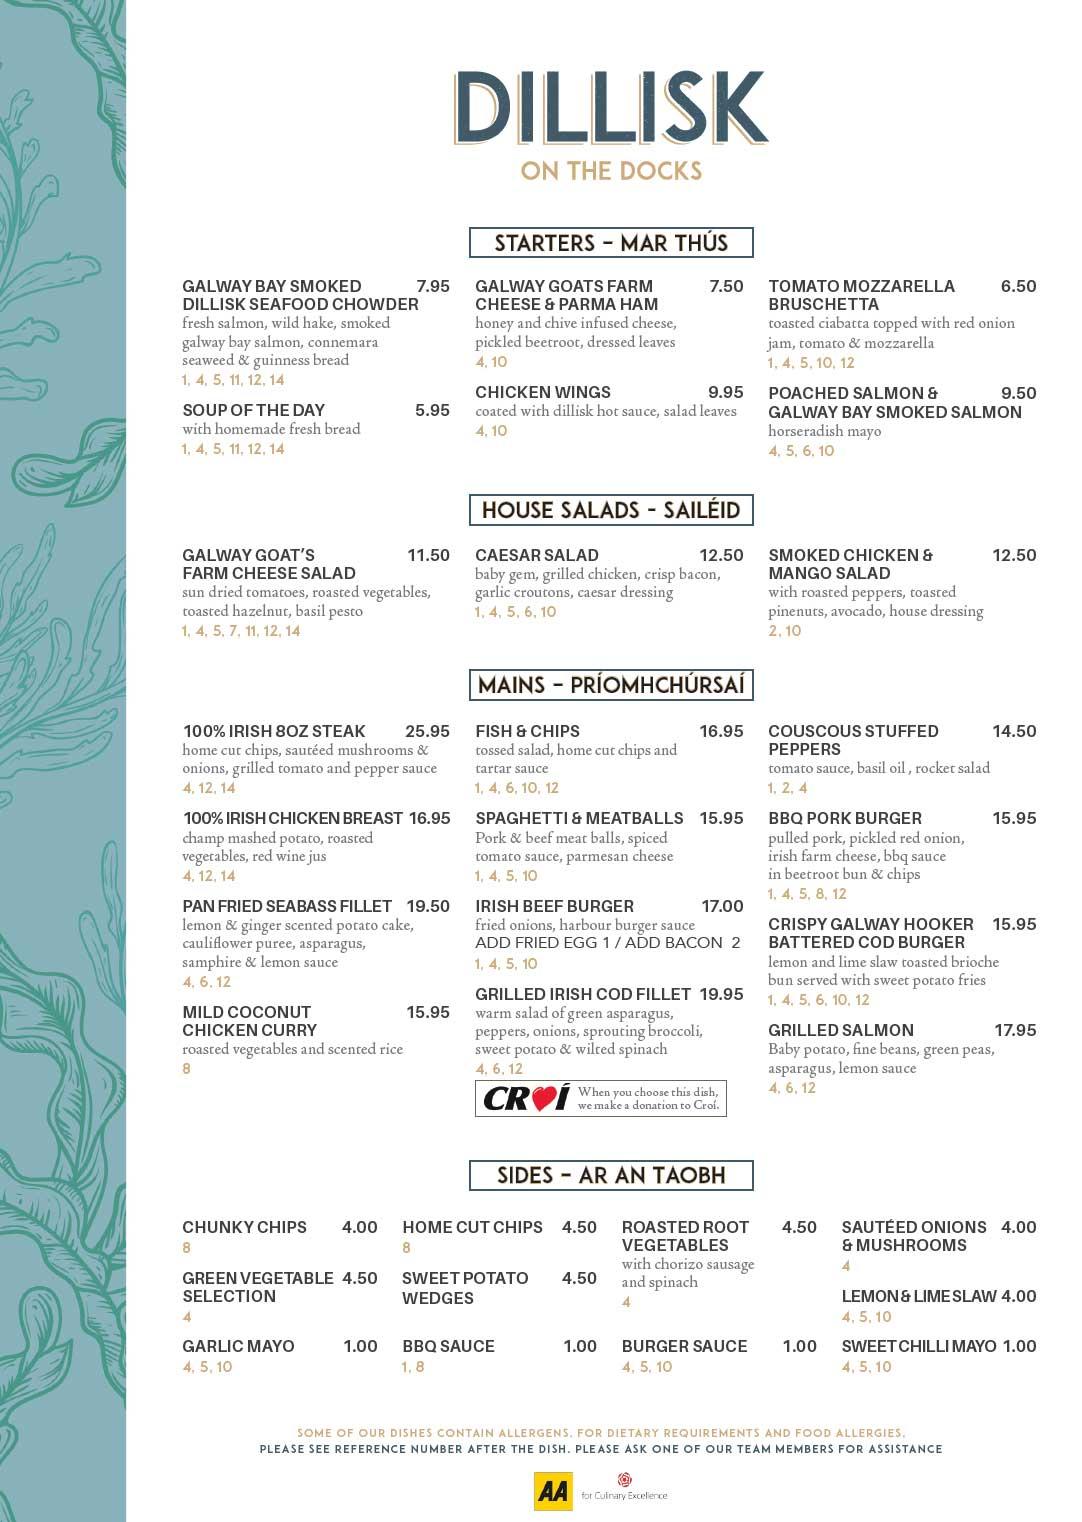 The a la carte menu at Dillisk on the Docks